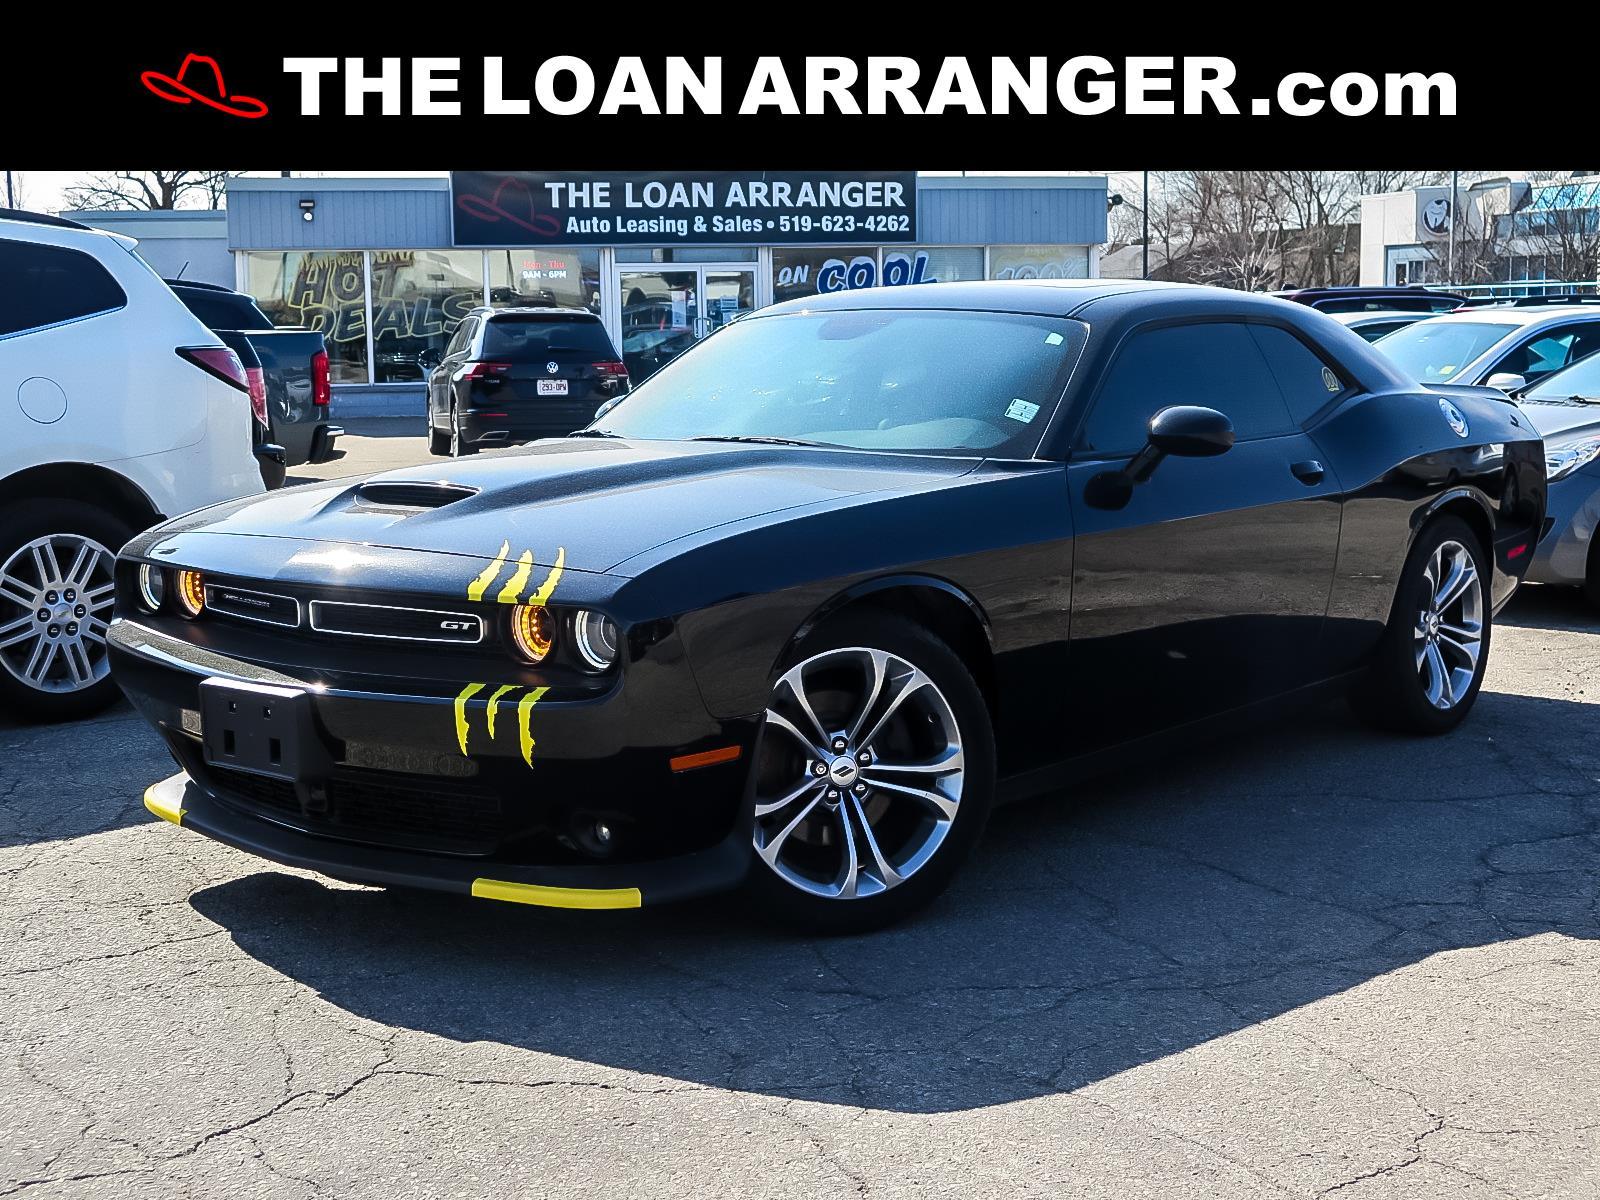 used 2020 Dodge Challenger car